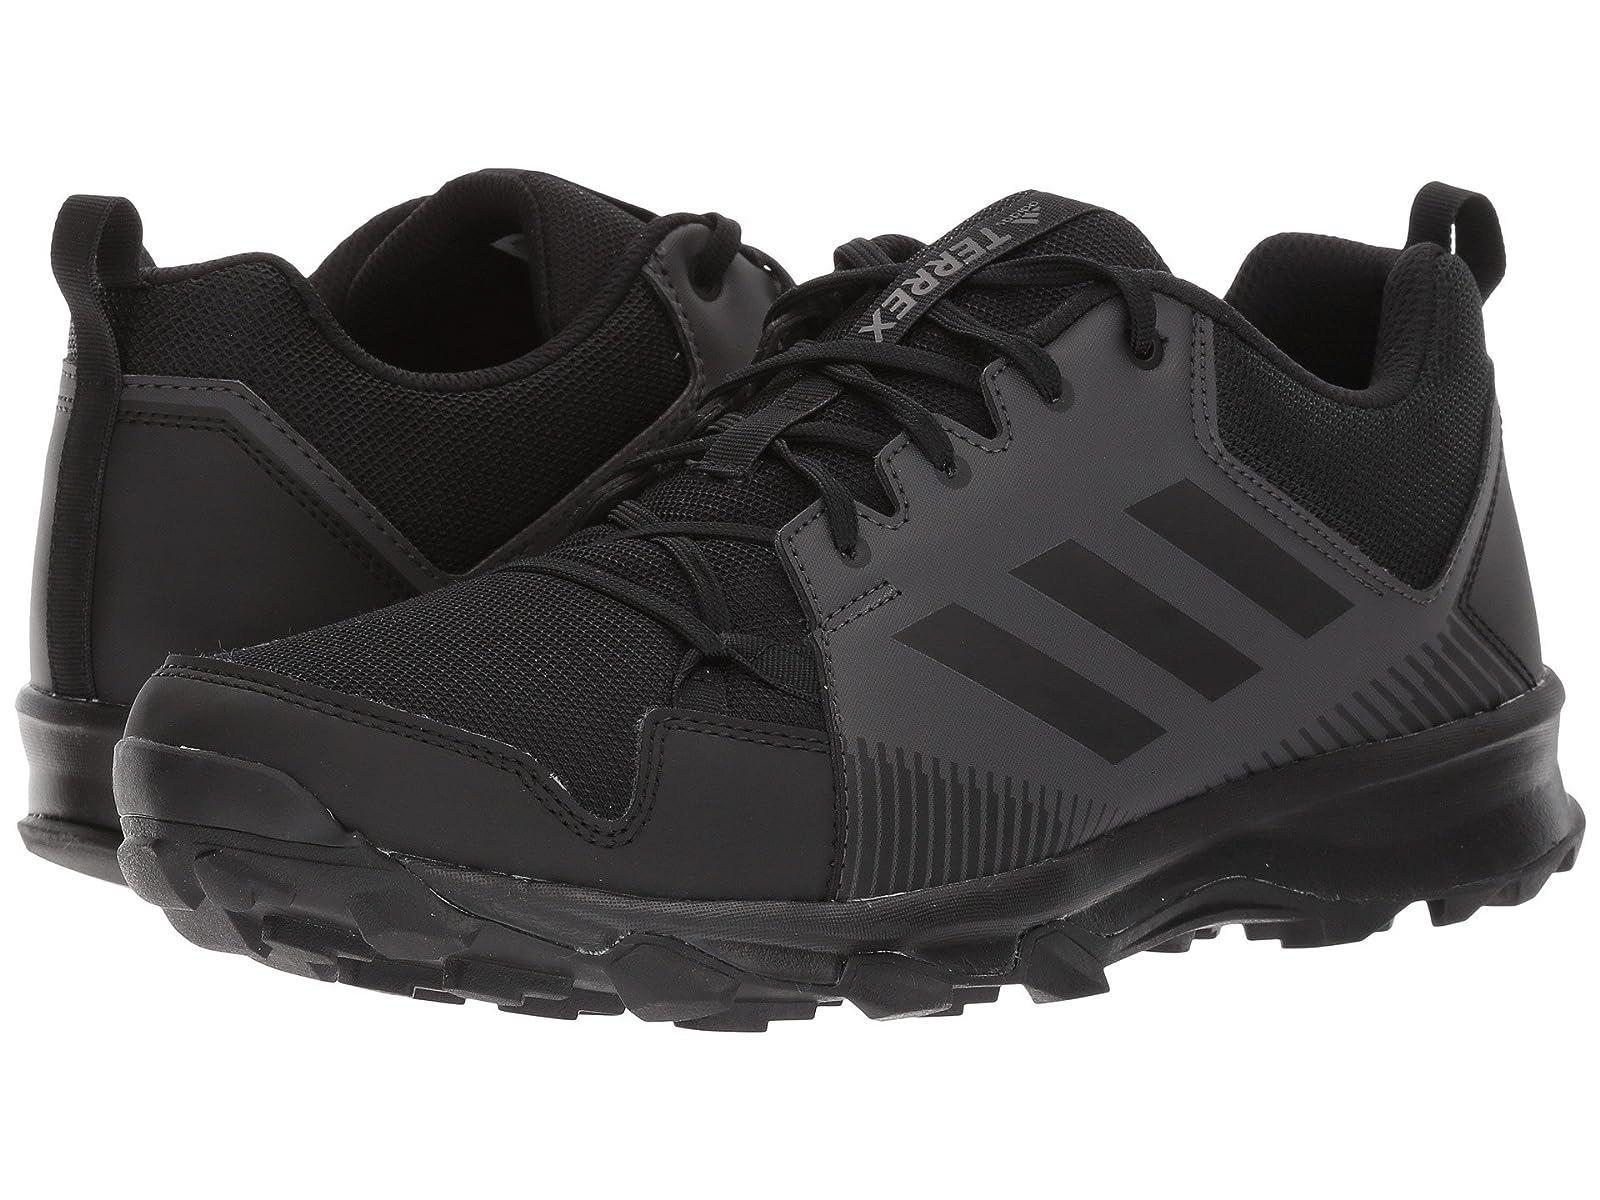 adidas Outdoor Terrex TracerockerAtmospheric grades have affordable shoes